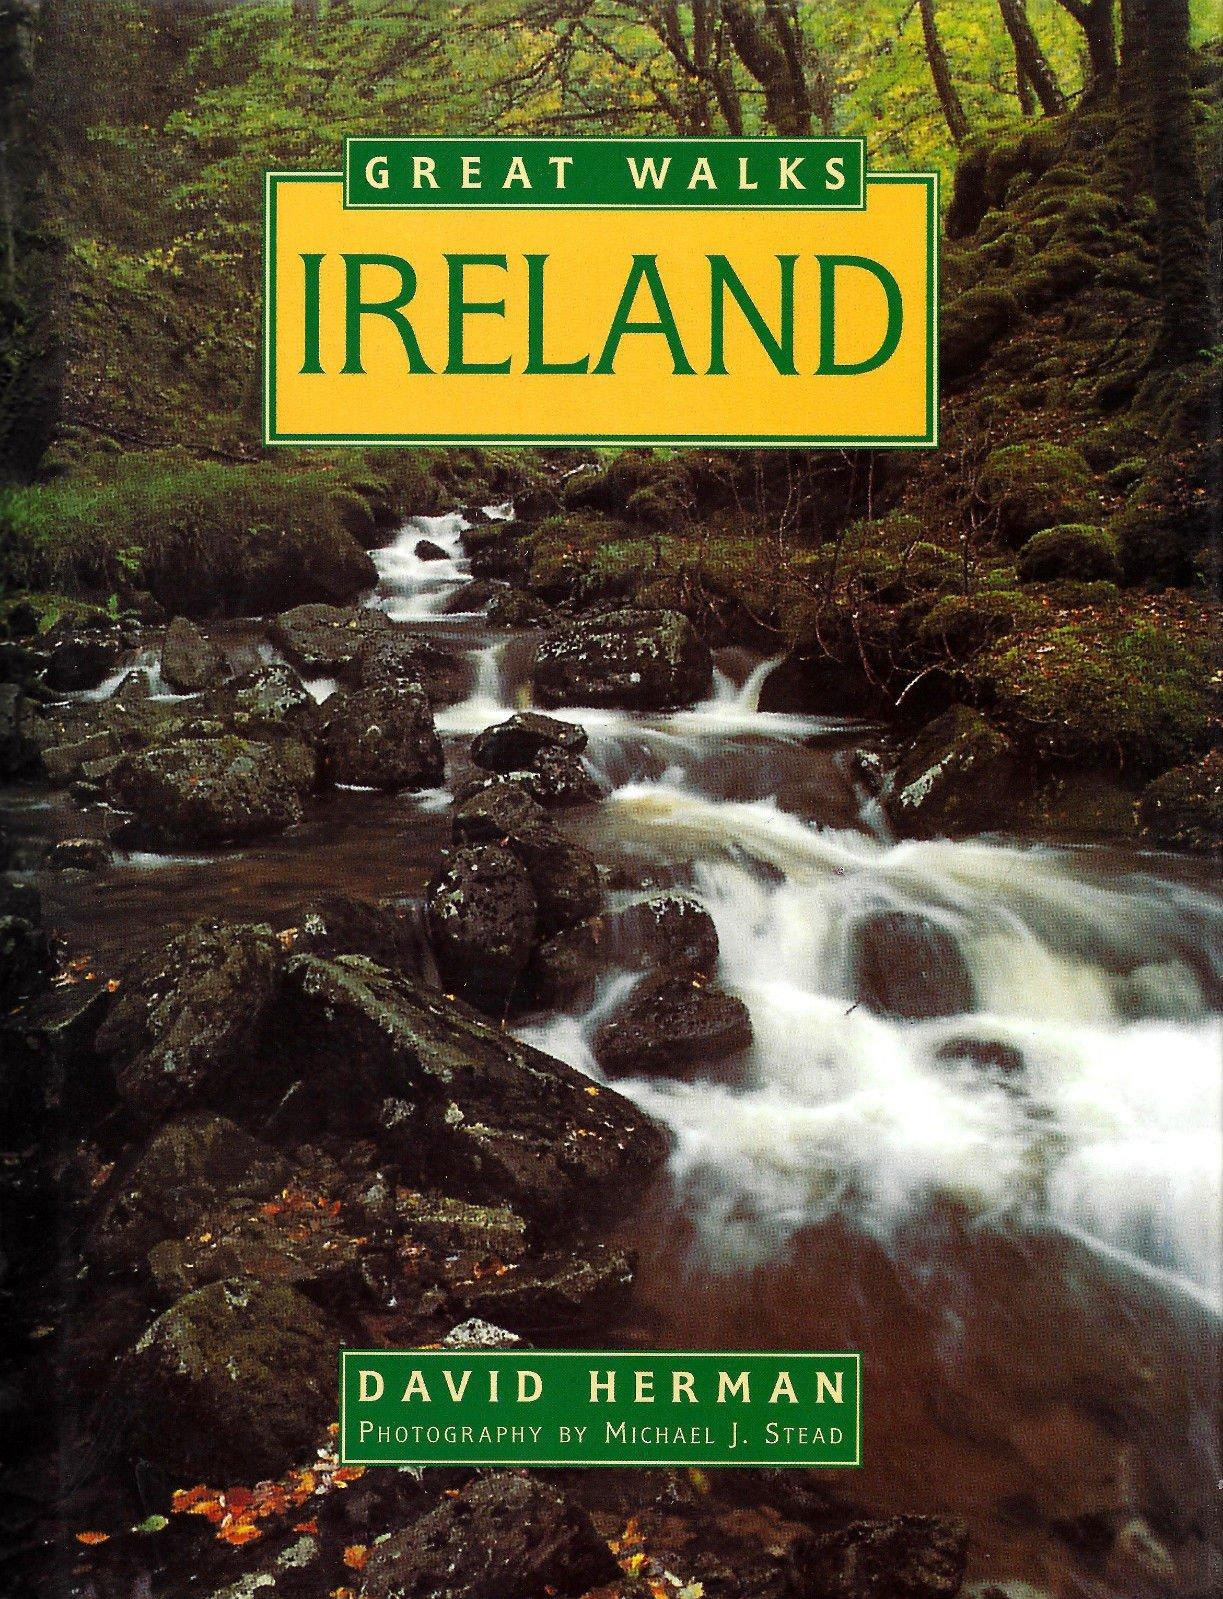 Great Walks: Ireland